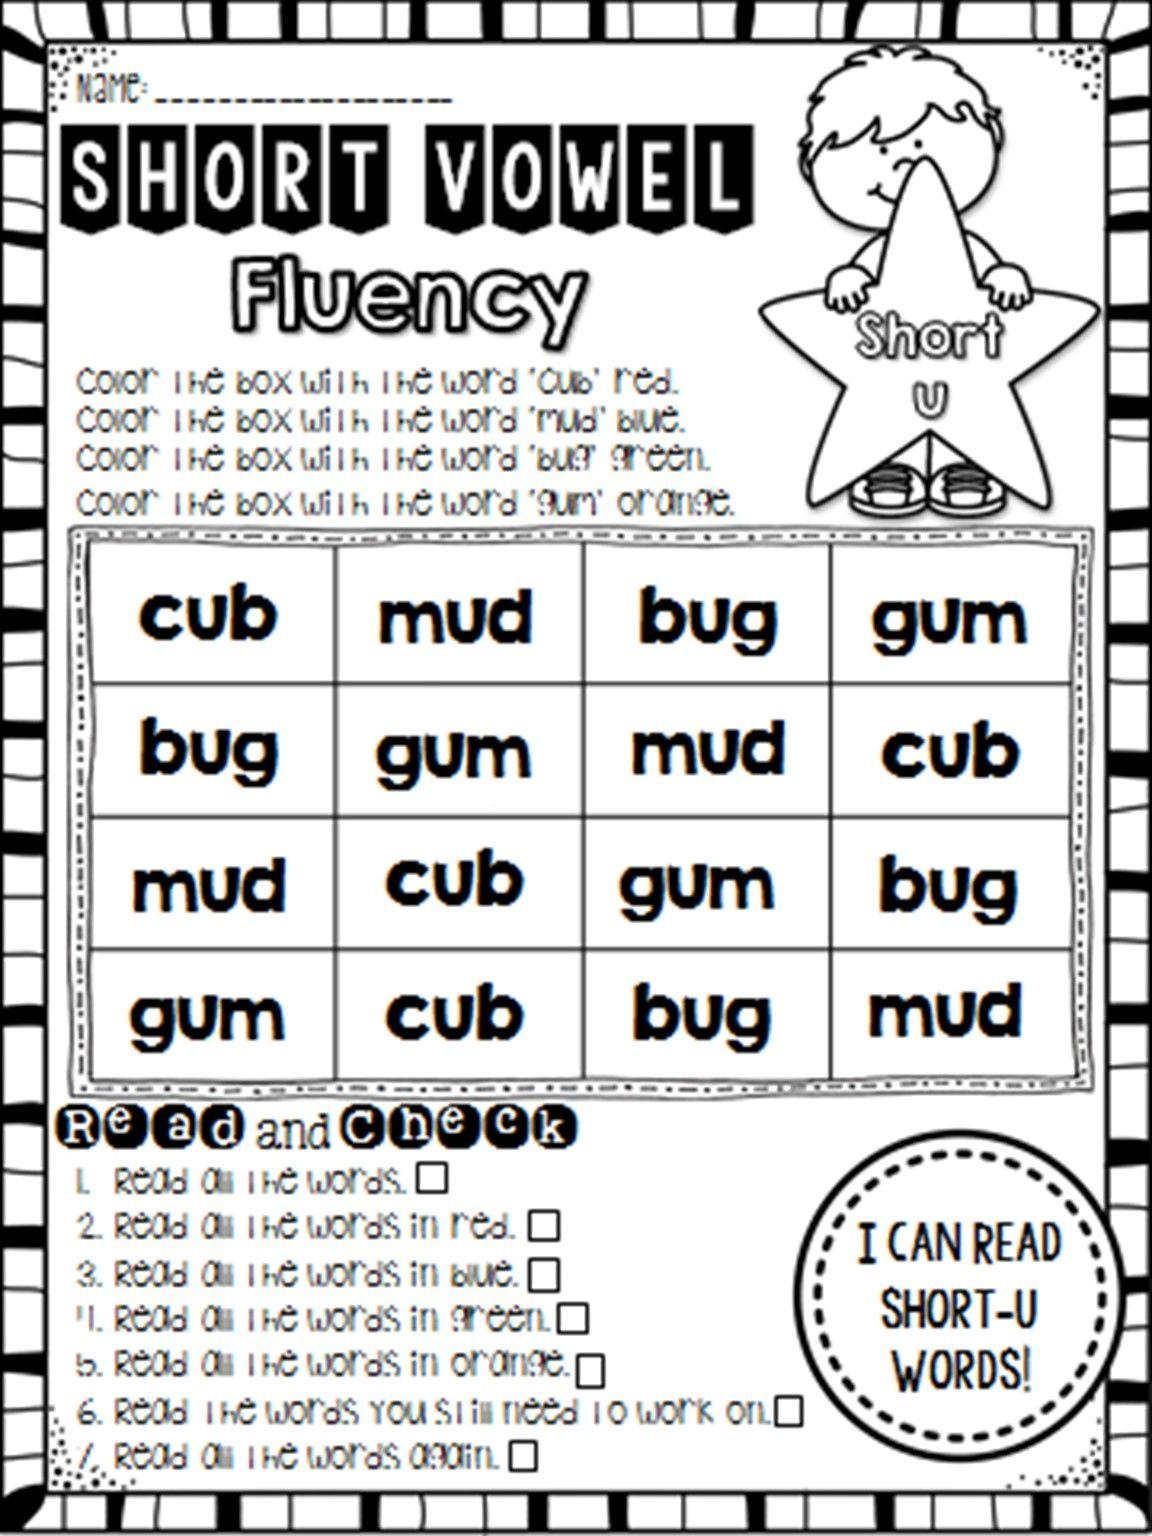 Vowel Fluency Short U Cvc Words